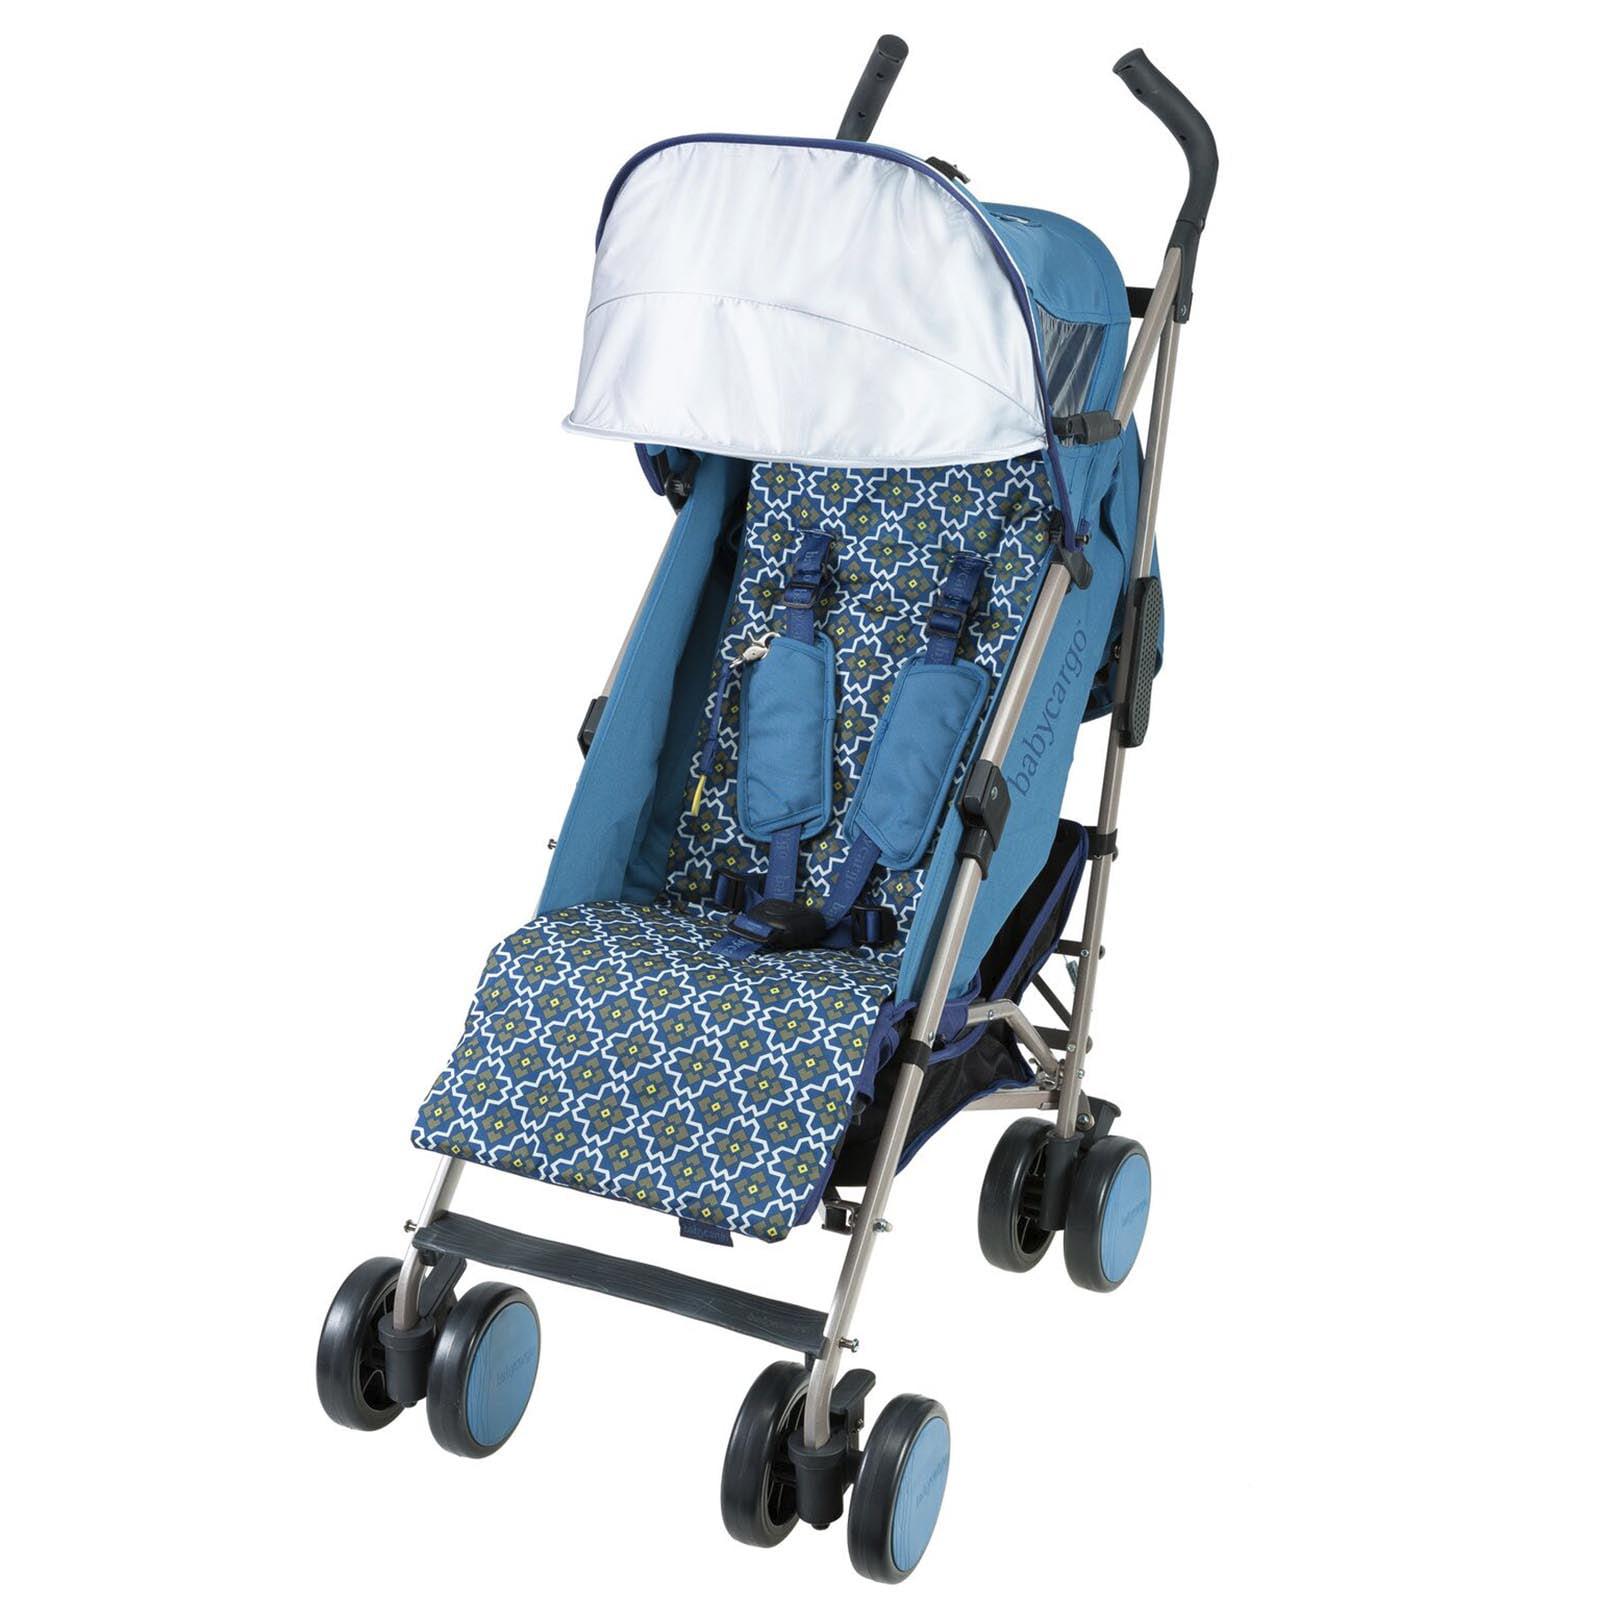 Baby Cargo 300 Series Lightweight Umbrella Stroller (Ocean) by Baby Cargo